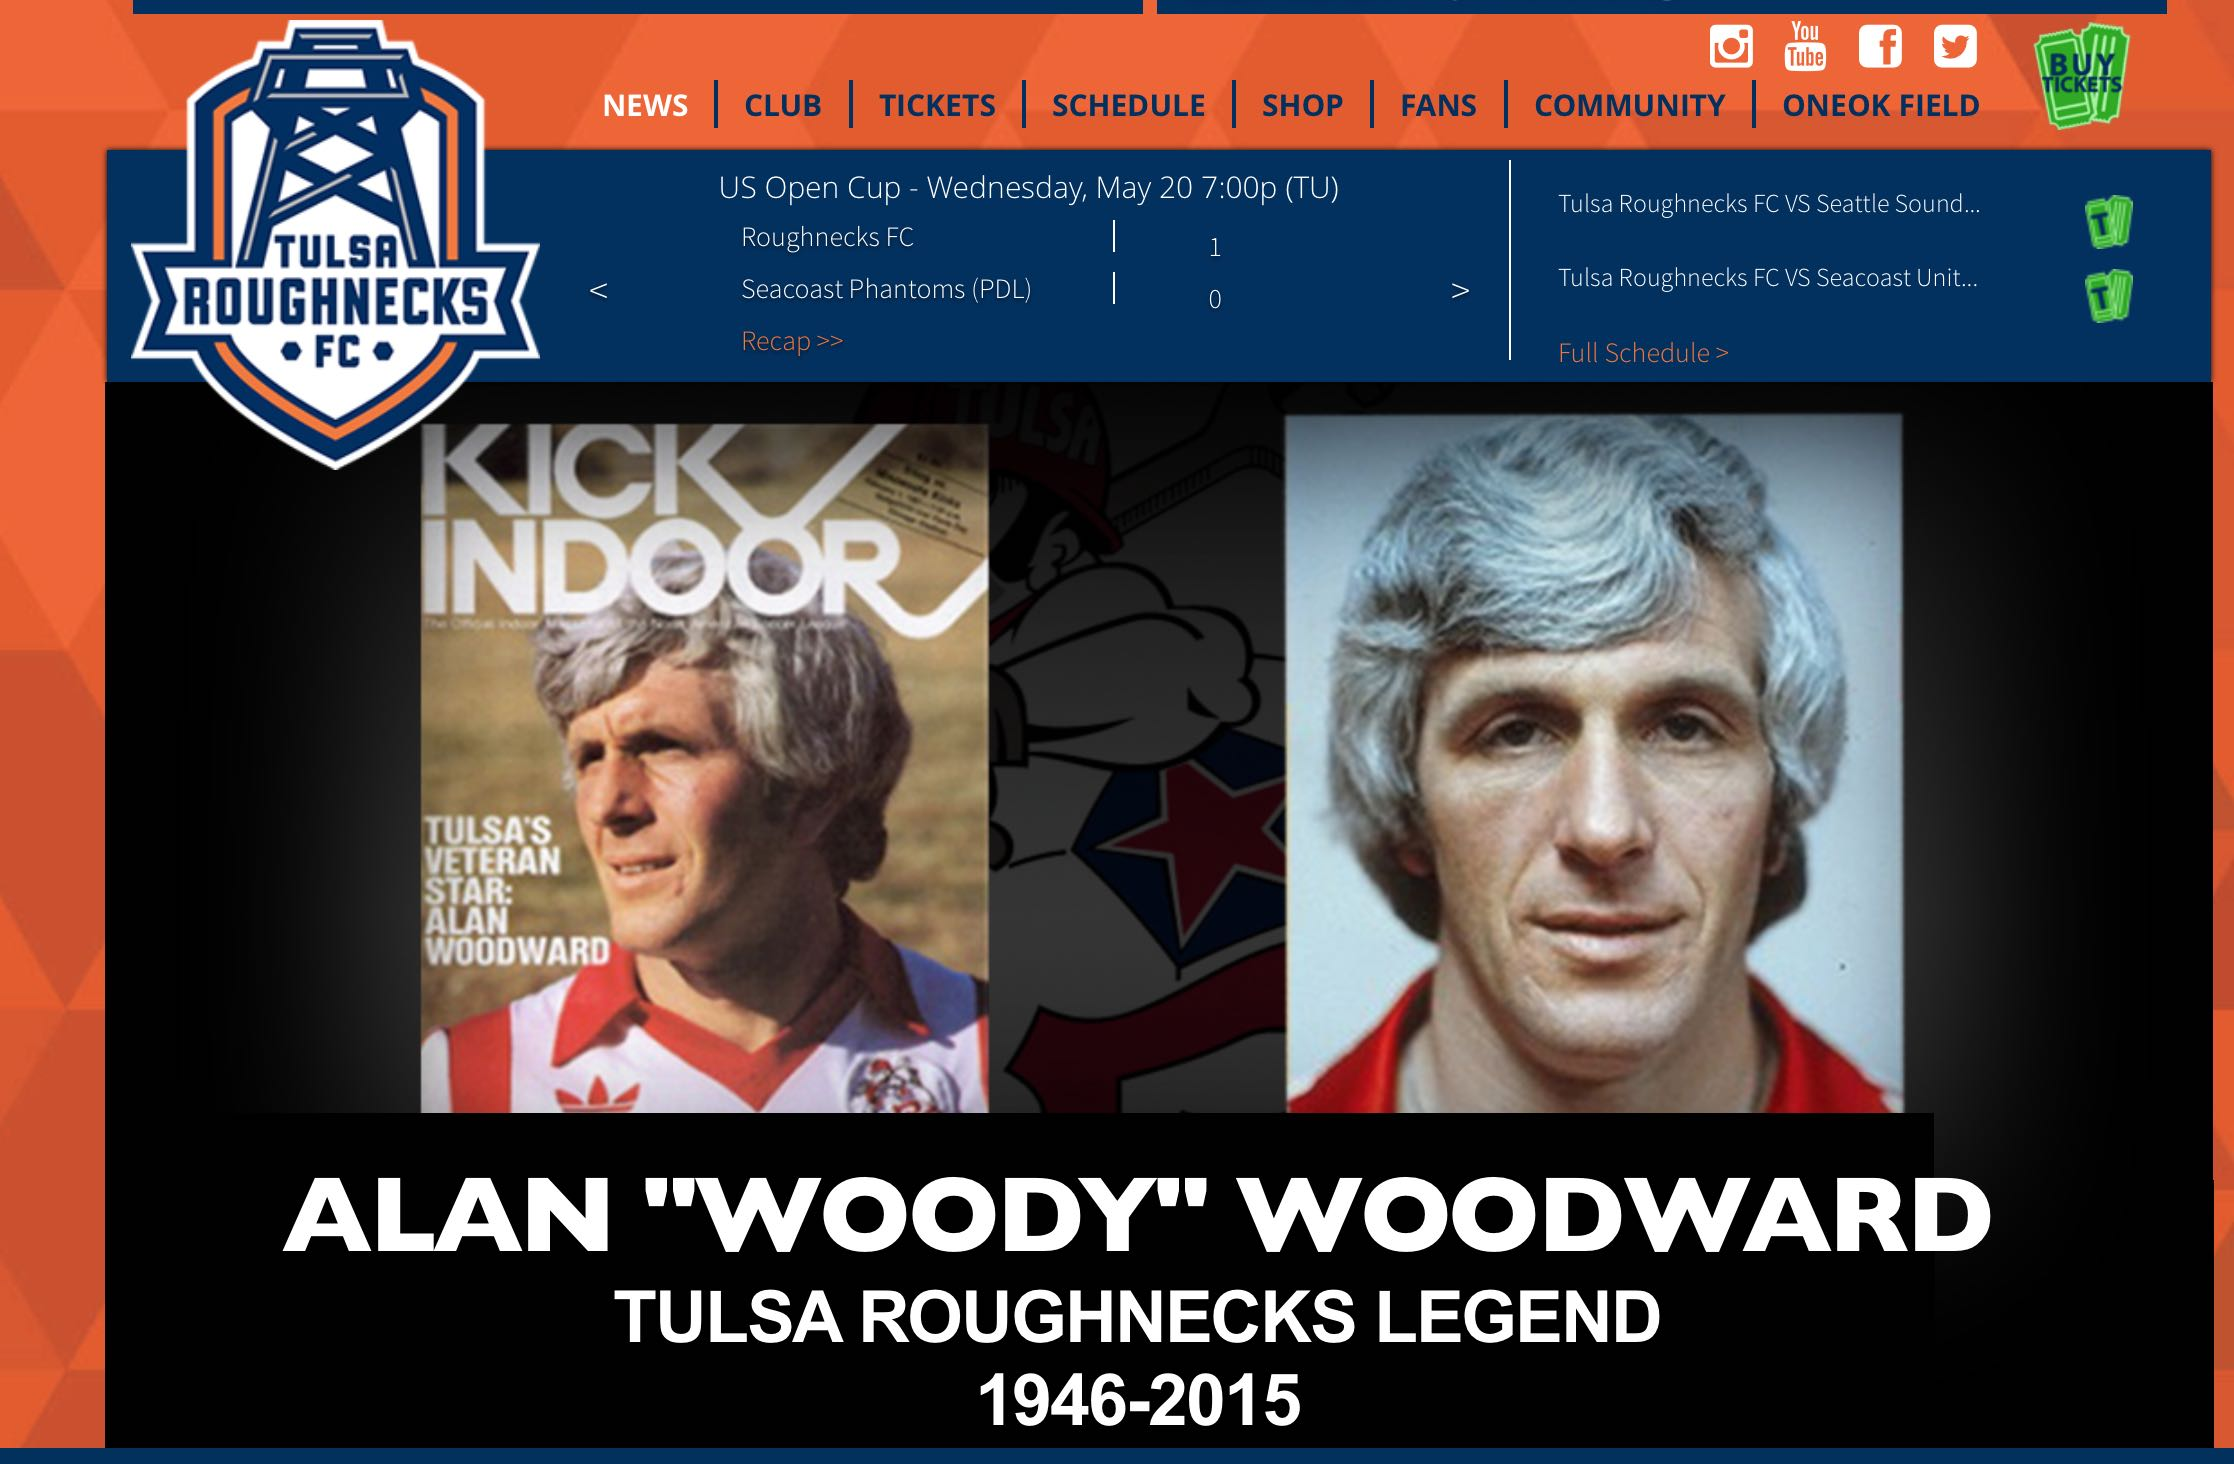 SALUTE ACROSS THE POND:  Tulsa Roughnecks' website claim our Woody as their own